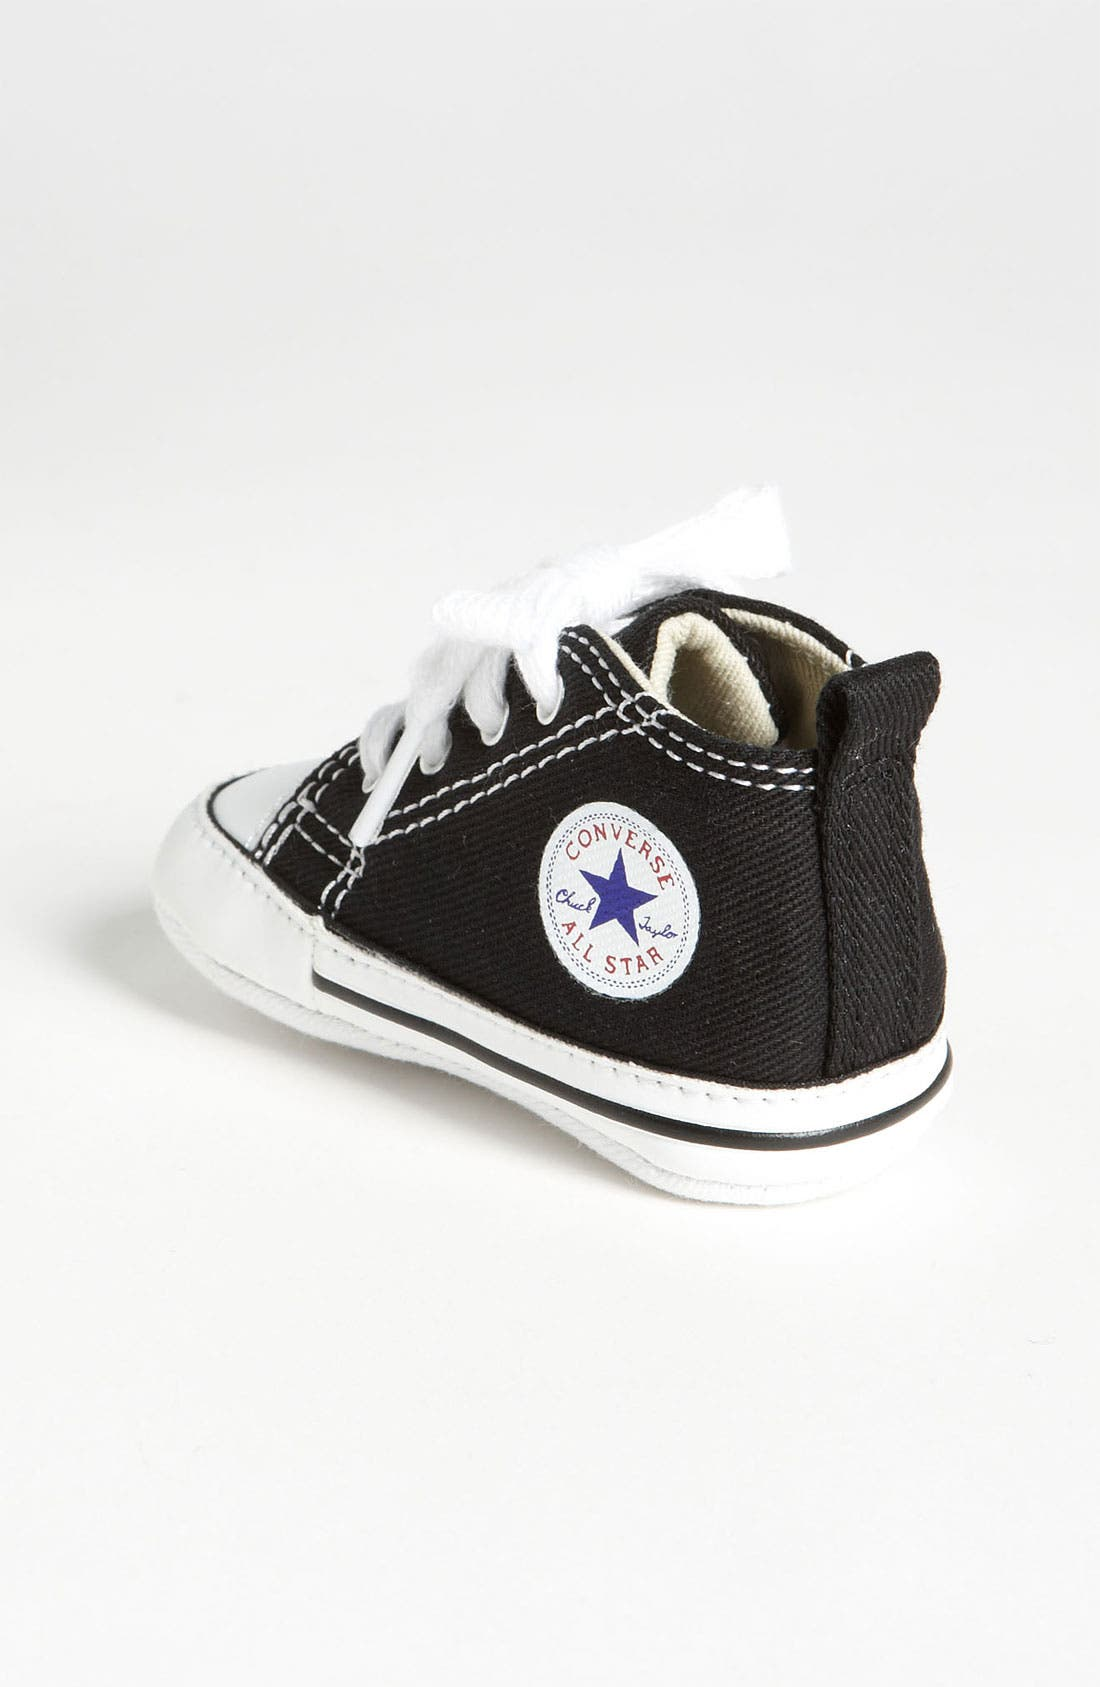 CONVERSE, Chuck Taylor<sup>®</sup> Crib Sneaker, Alternate thumbnail 2, color, BLACK